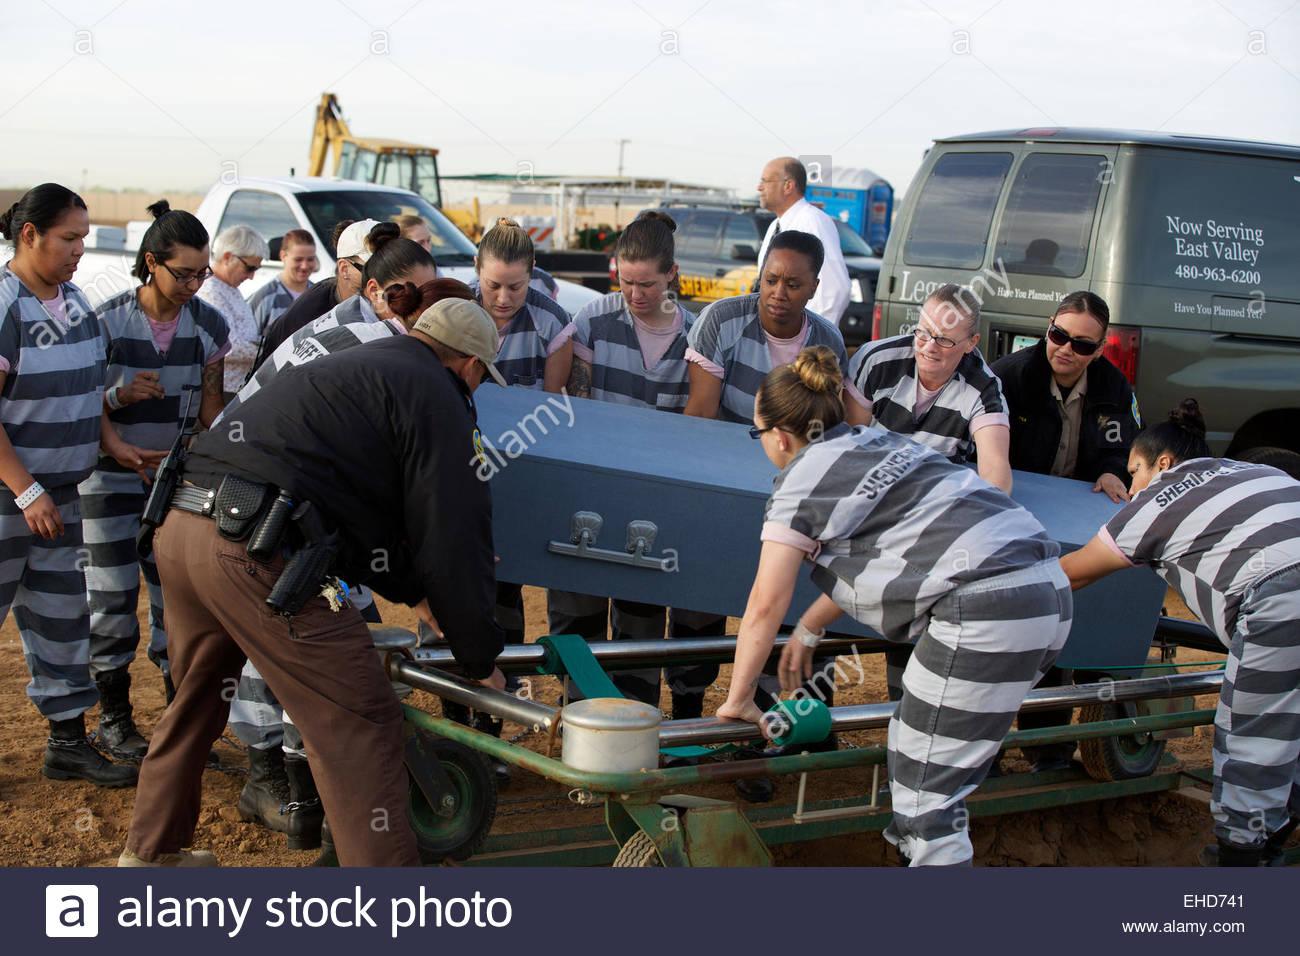 Tent City Jail Americau0027s toughest jail run by Sheriff Joe Arpaio in Phoenix Arizona & Tent City Jail Americau0027s toughest jail run by Sheriff Joe Arpaio ...